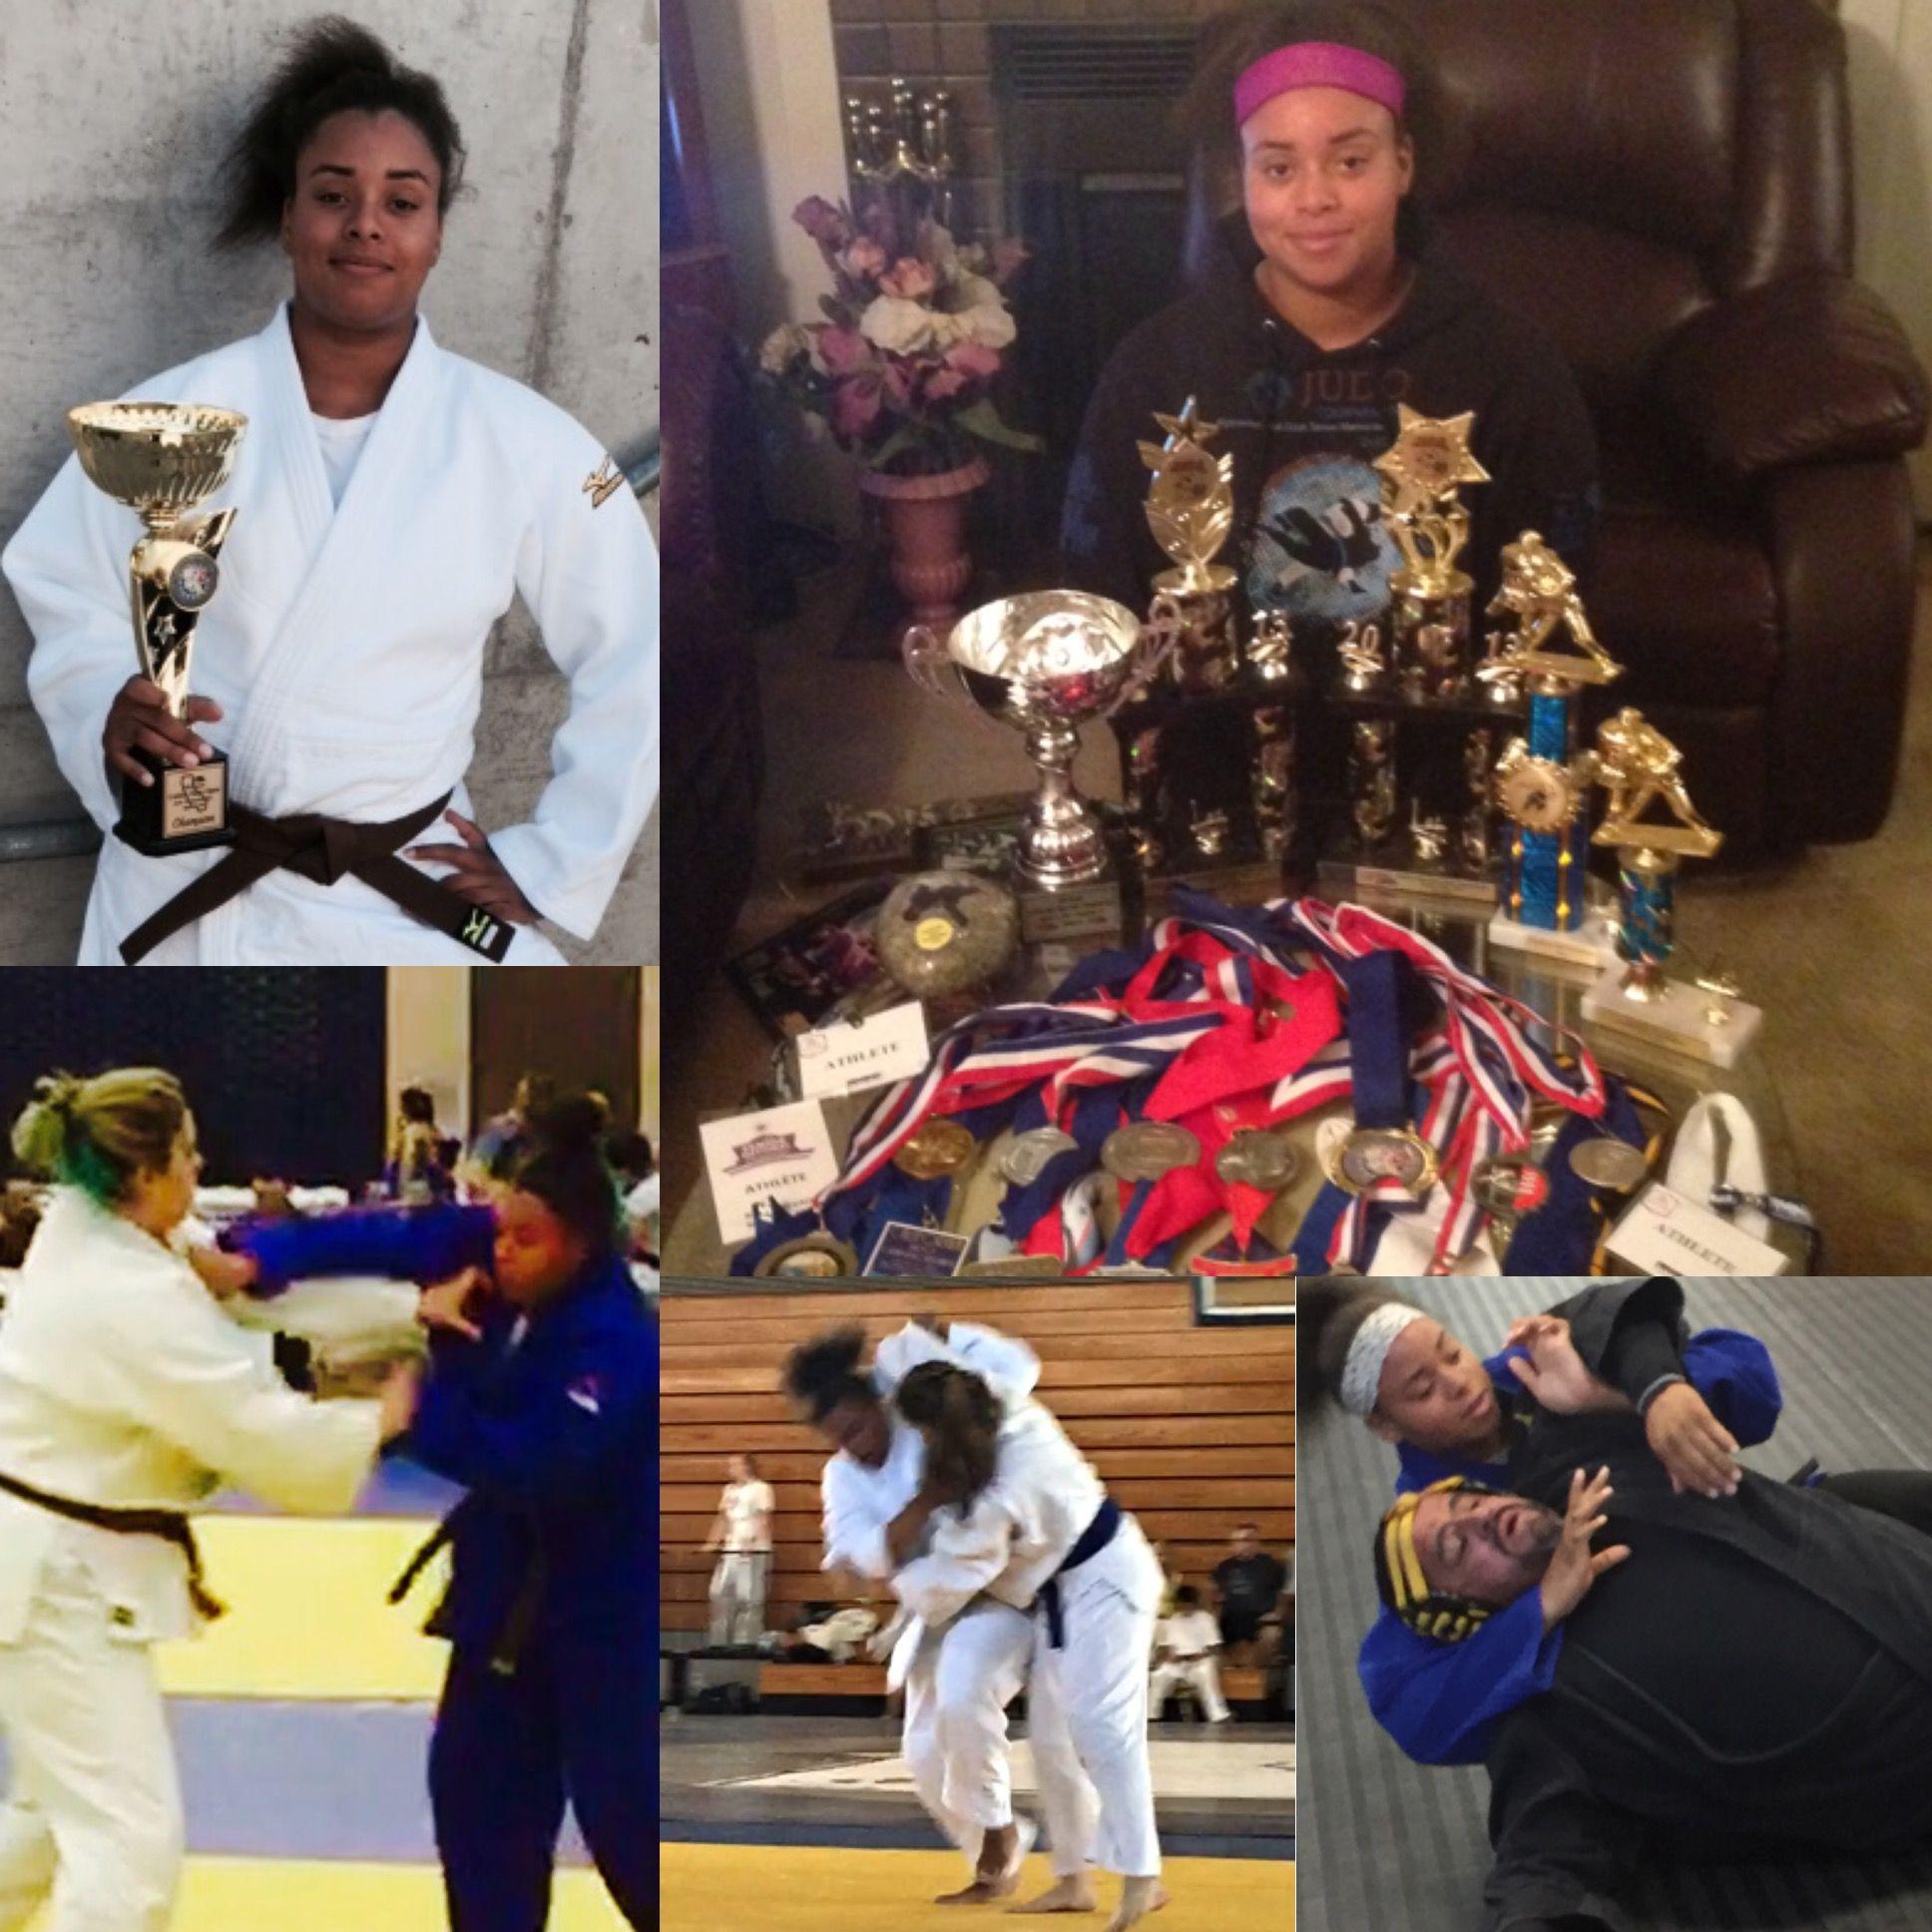 Nationally ranked judo player soon to be international hopeful. She